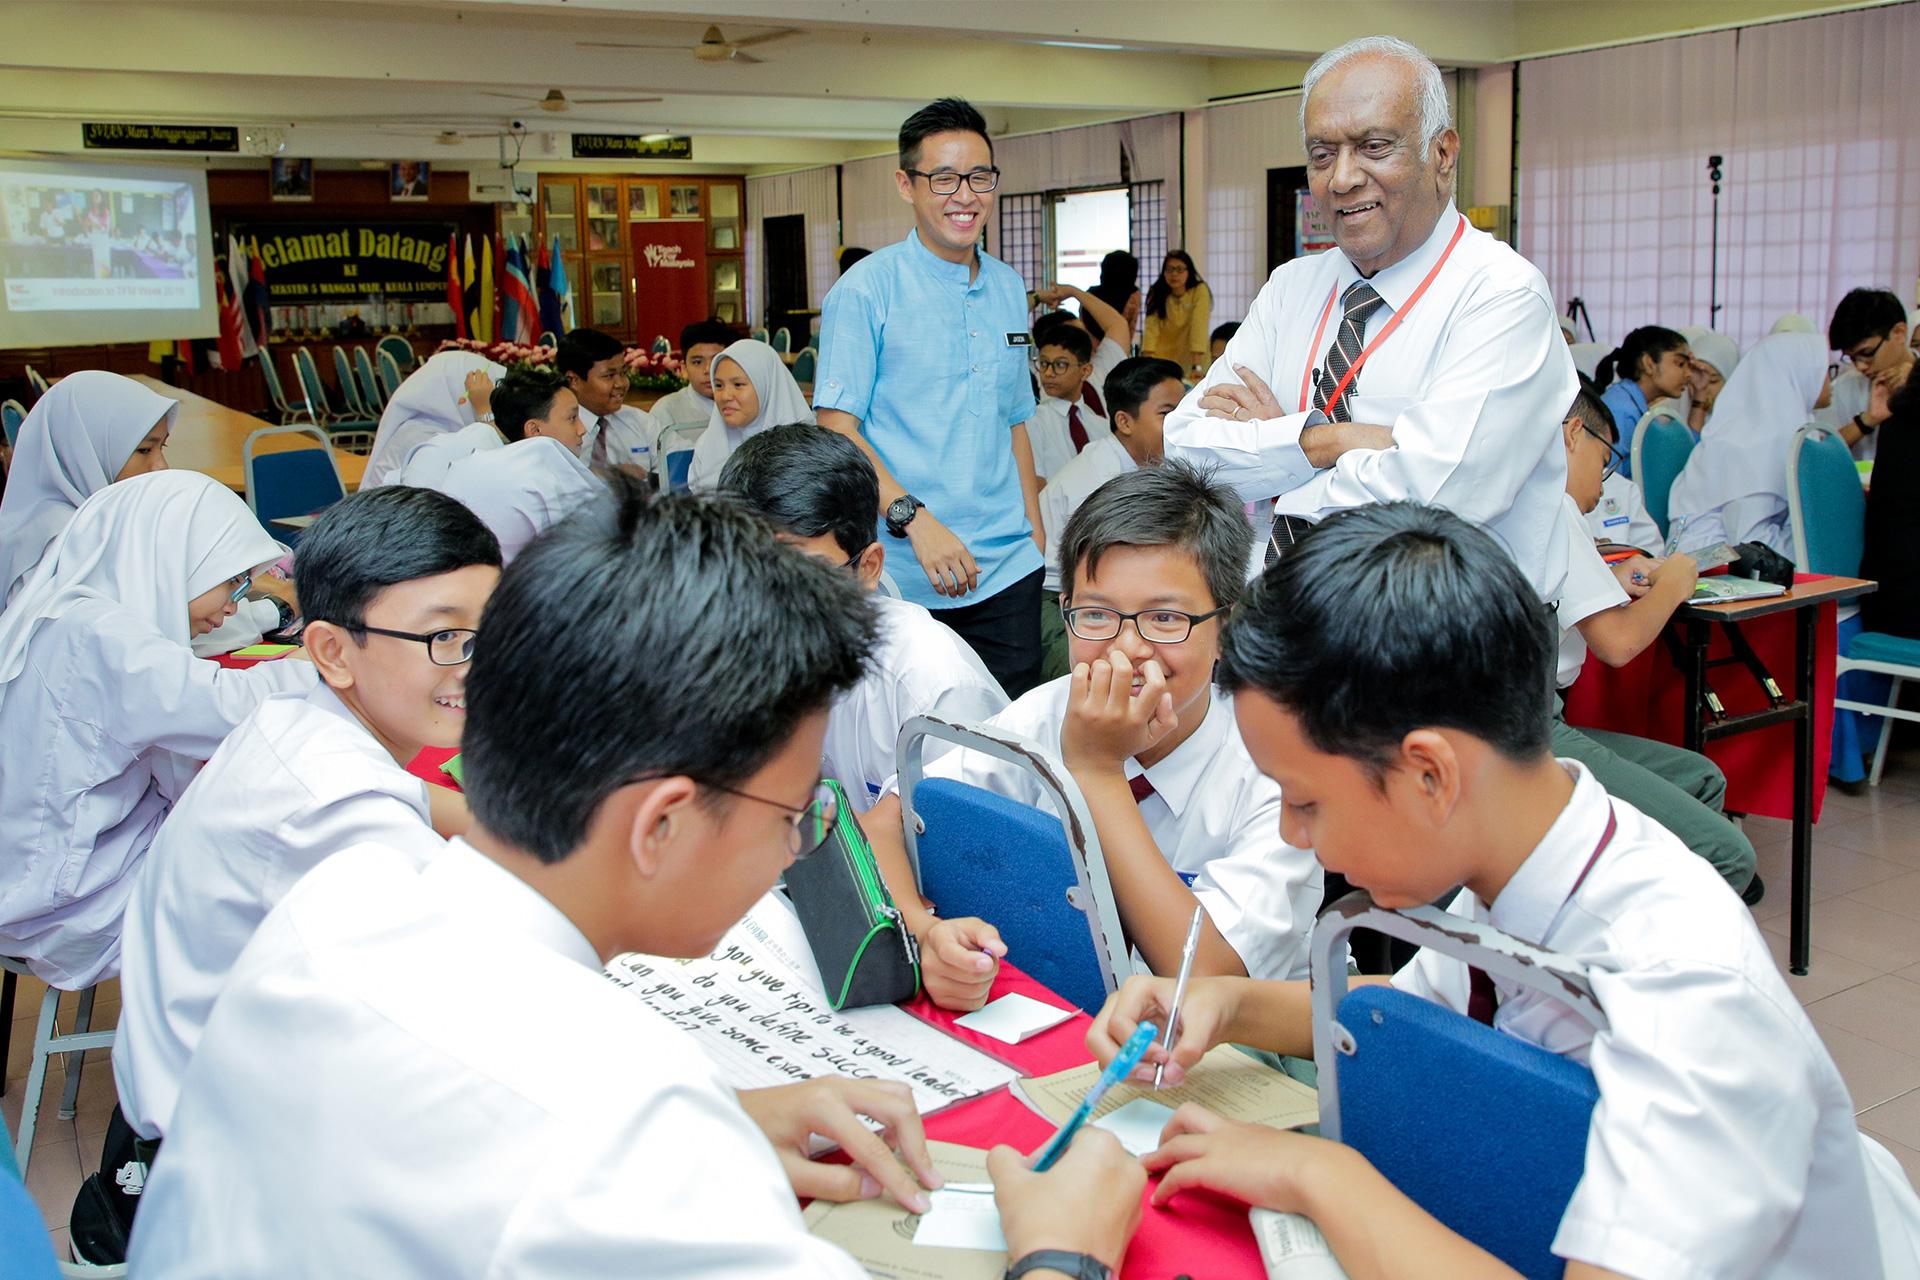 Jeffrey Cheah Foundation Trustee Tan Sri Ramon Navaratnam Teaches Students English